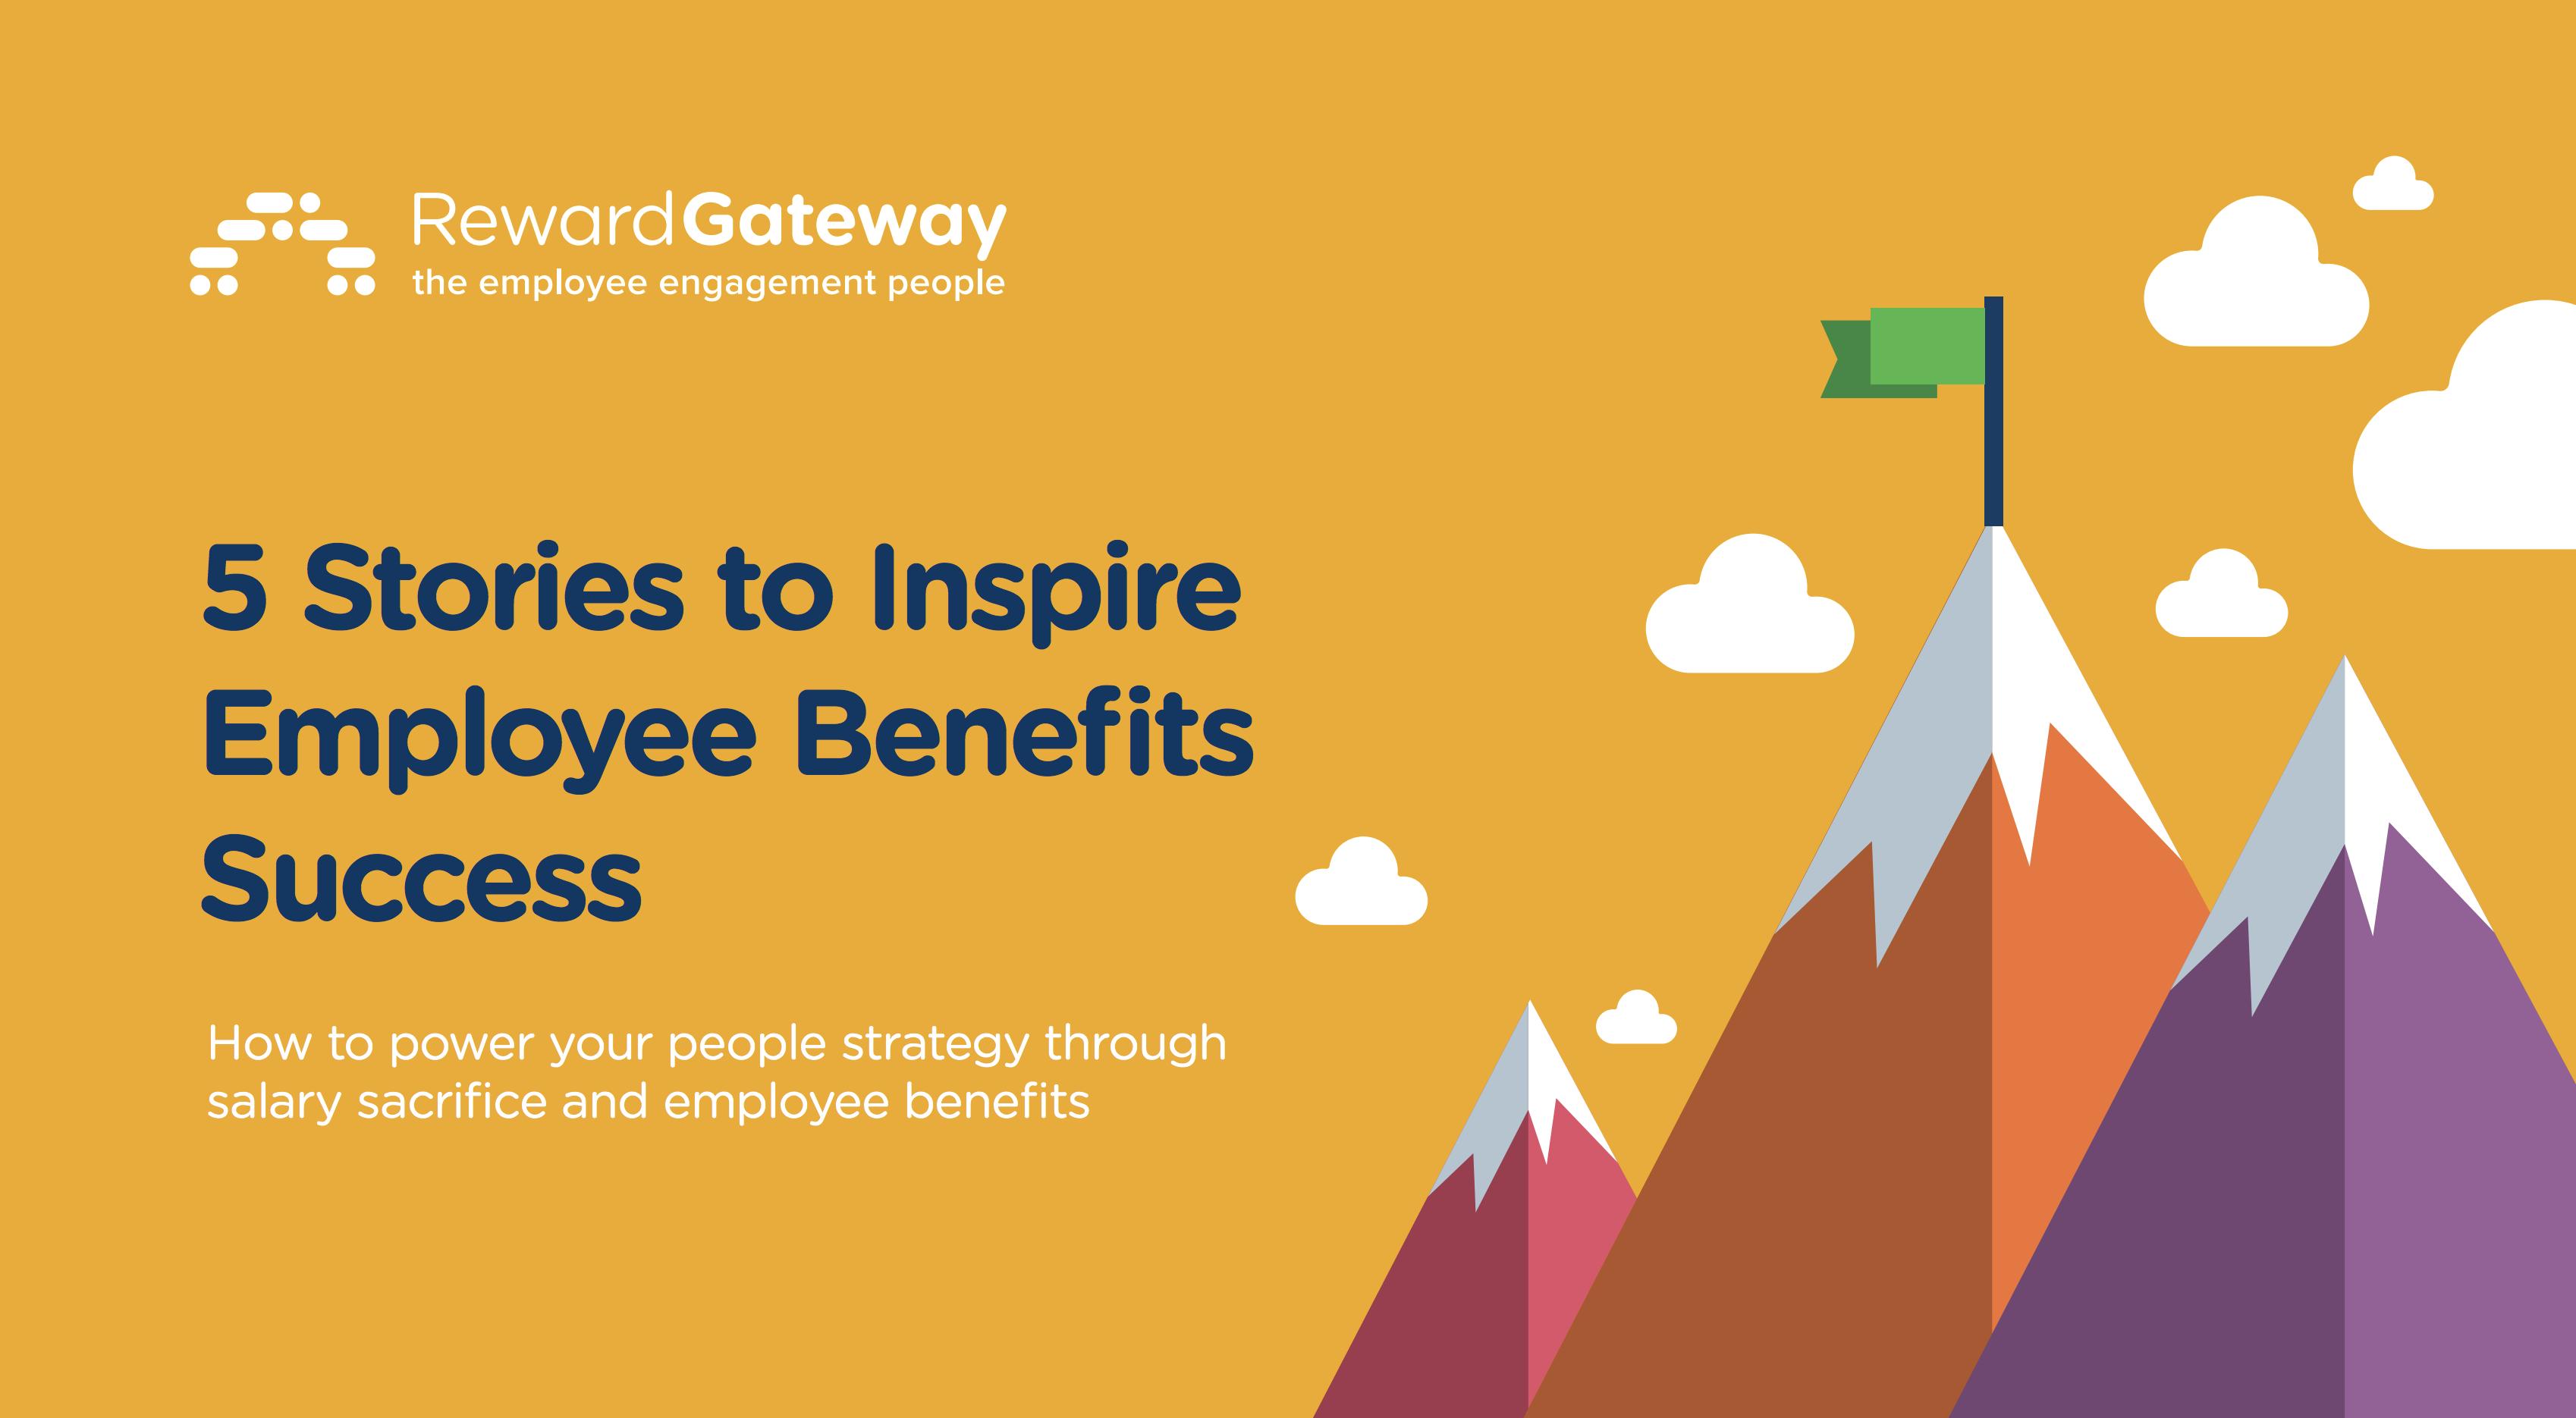 5 Stories to Inspire Employee Benefits Success